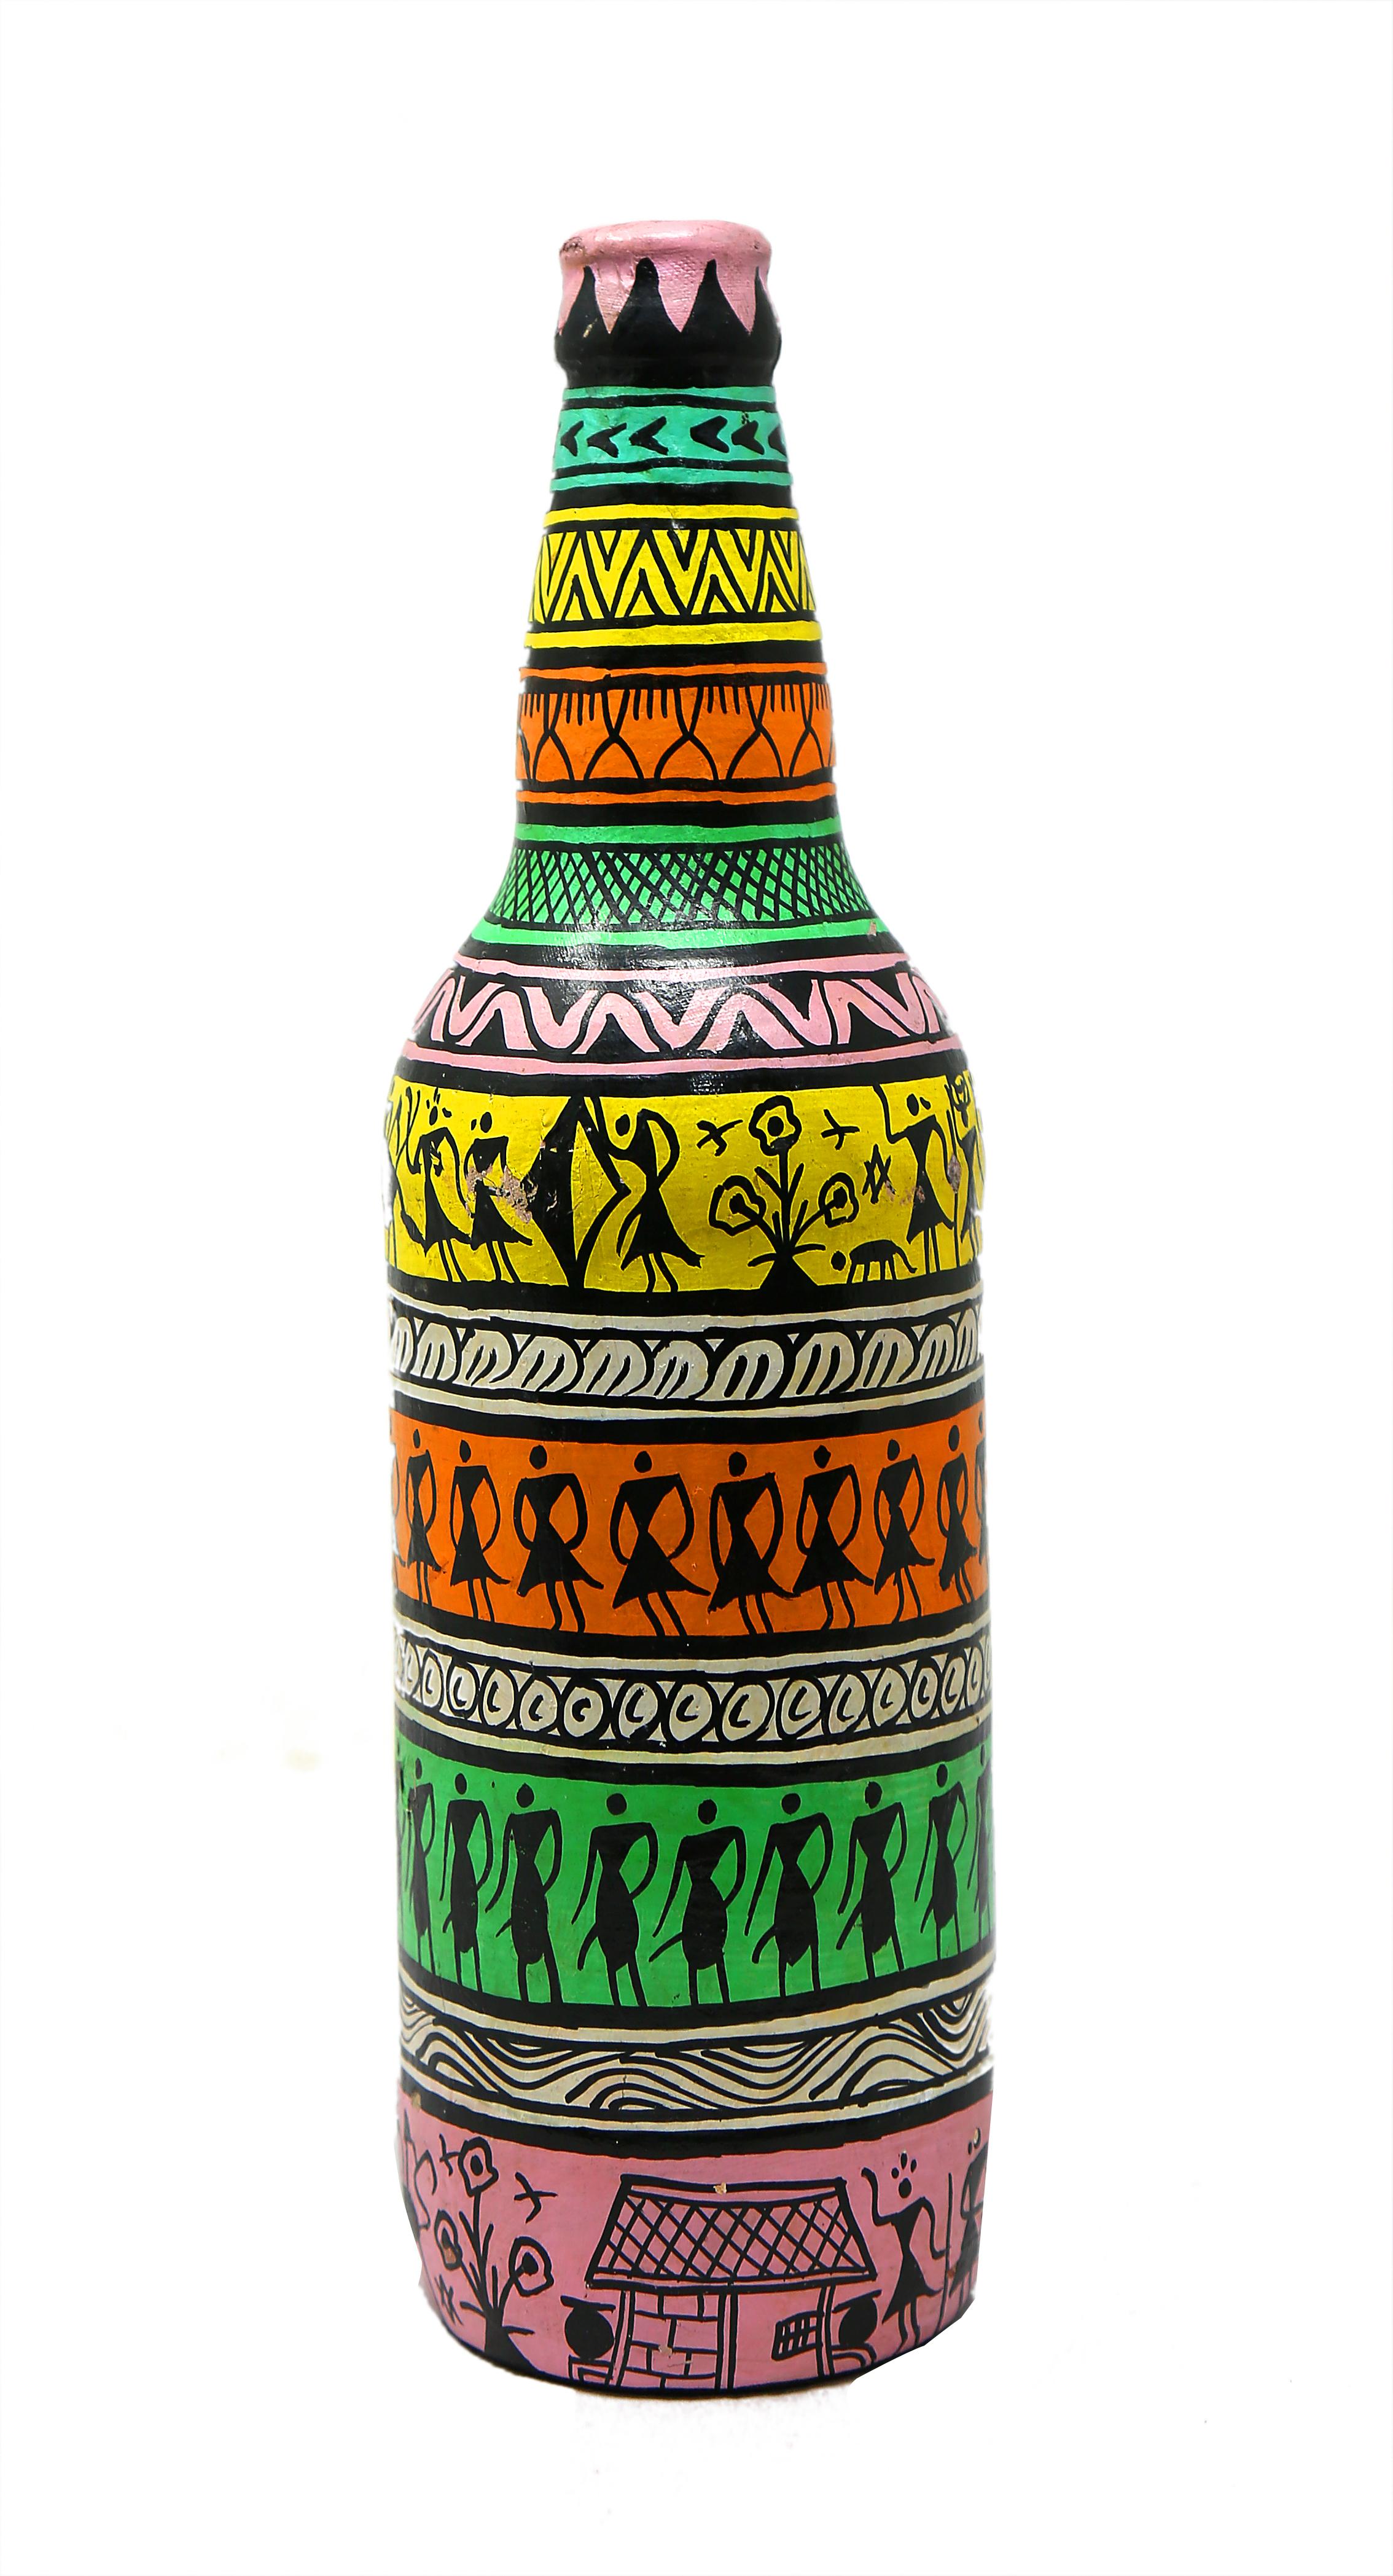 Kalgudi Multicoloured Warli Art Glass Bottle Painting